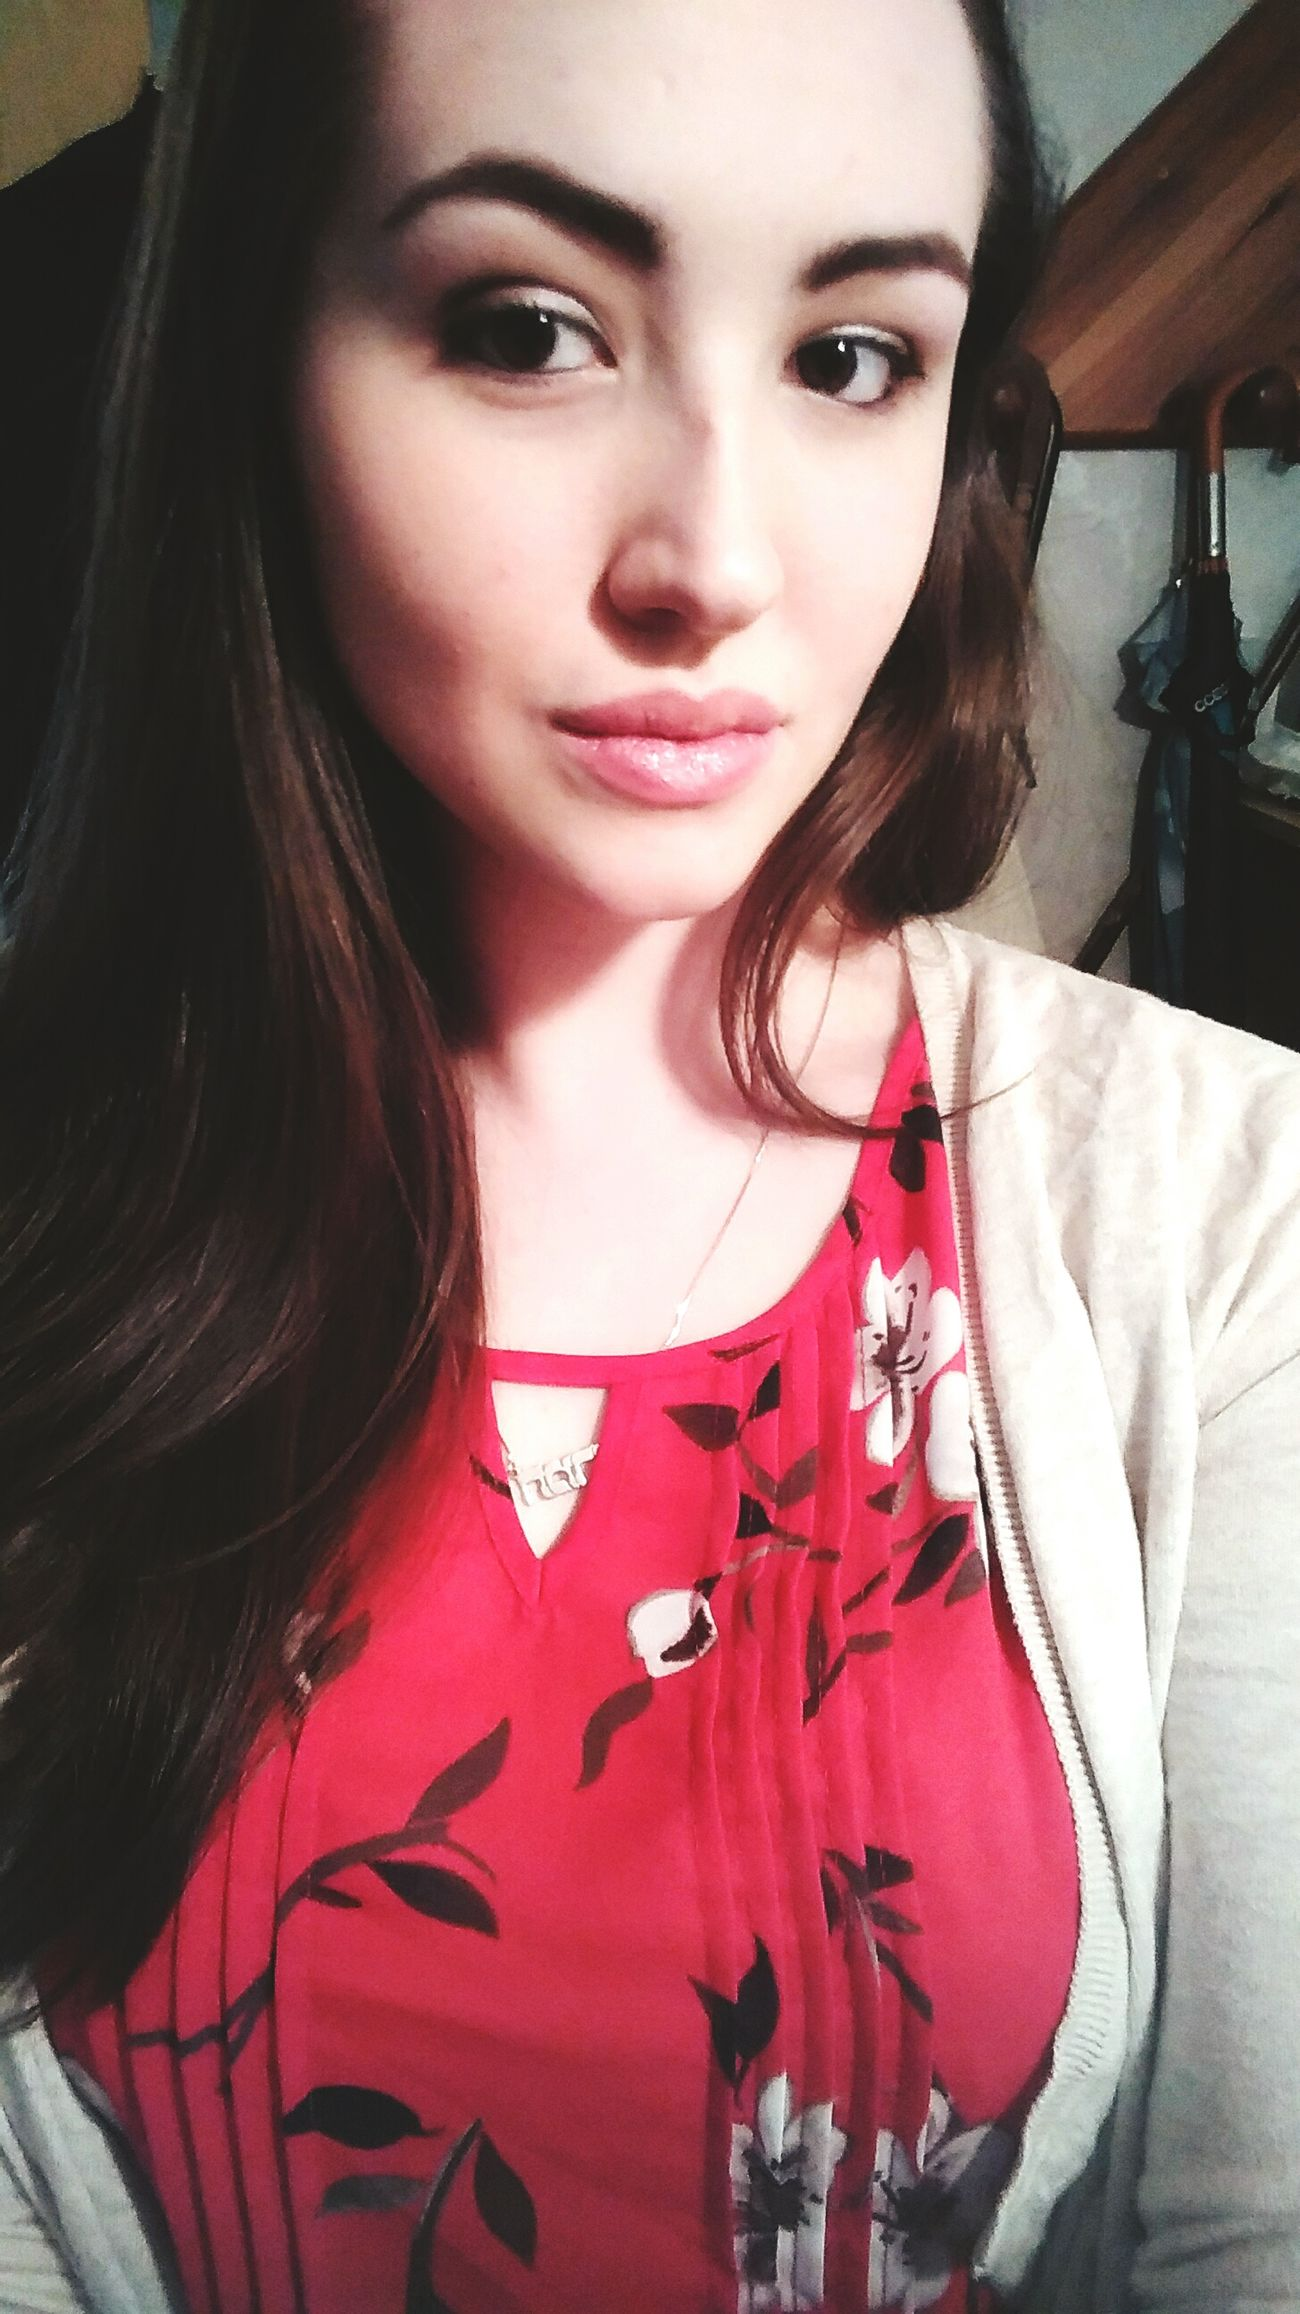 Hotgirls Girl SexyAsFuck Cute Beauty Sexywomen Sexy♡ EyeEmGIRLS EyeemSelfie Doyoulikeit? Portrait Of A Woman Hotties Eyeemgirl Pretty Girl Longhair Followme Czechgirl Hottie Hotgirl SexyGirl.♥ Sexylips EyeEm Girl Of The Day Sexygirl Hot_shotz Hottie Girl